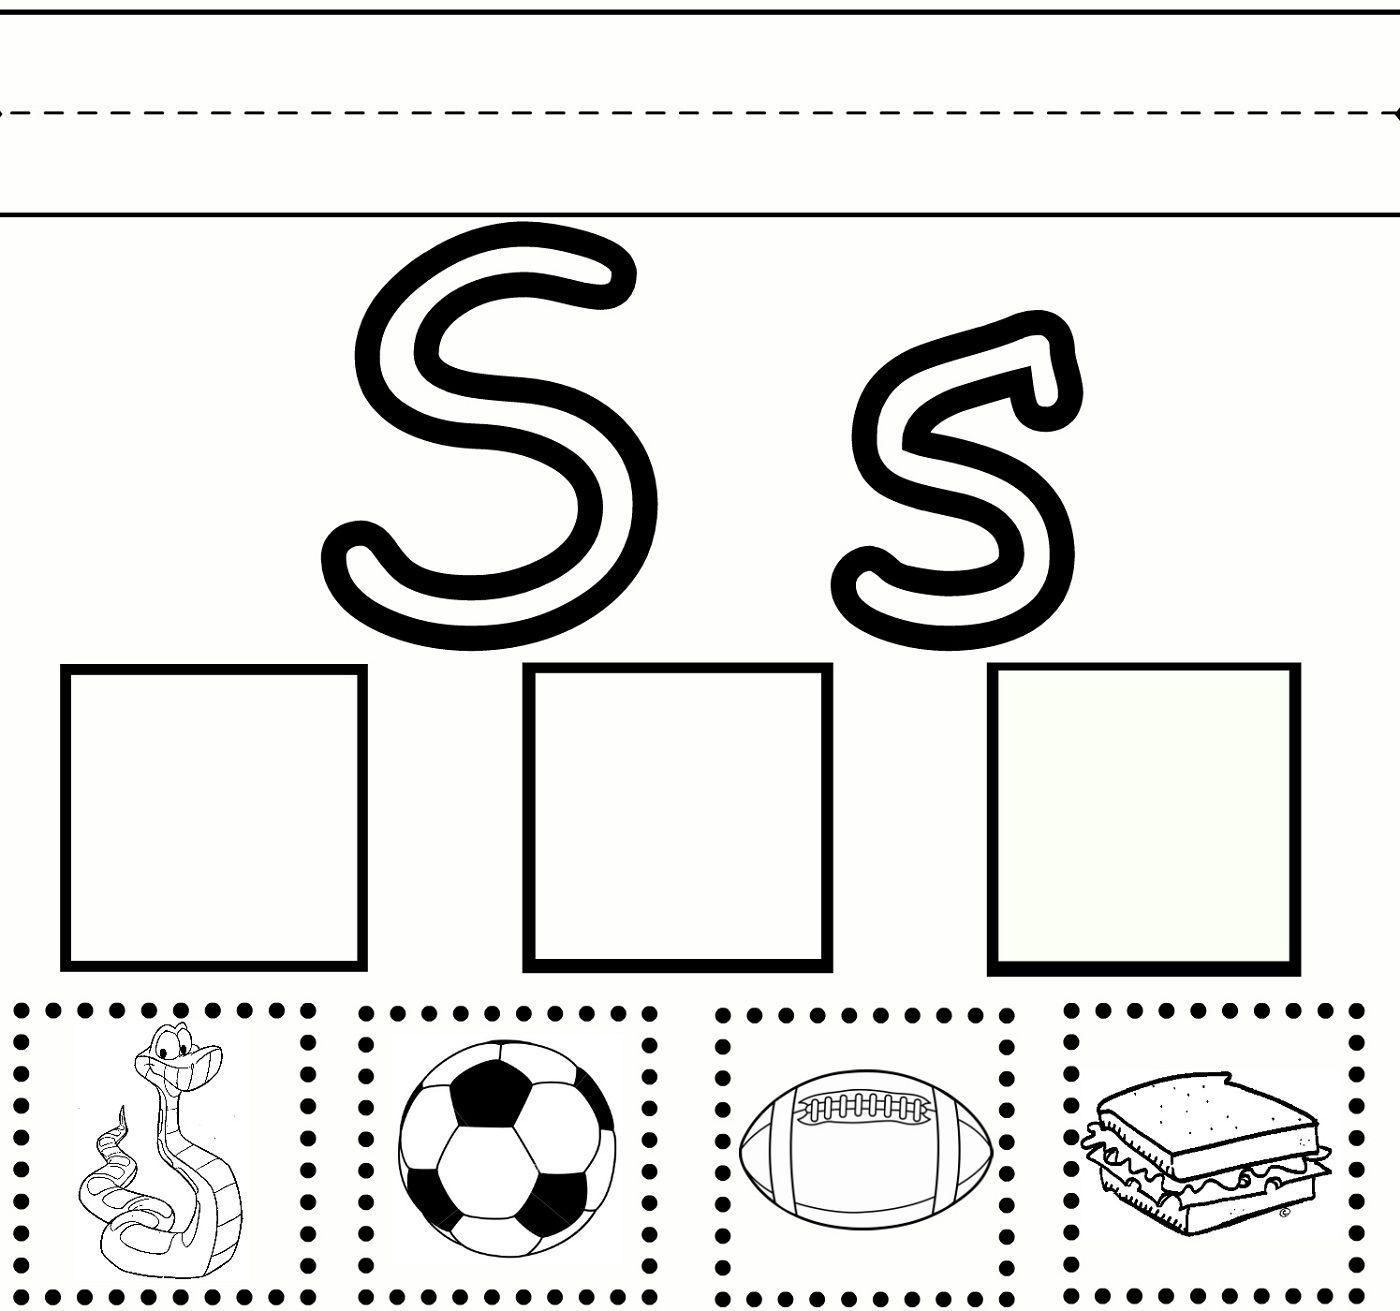 Free Printable S Worksheets Kiddo Shelter Letter S Worksheets Alphabet Worksheets Preschool Preschool Letters Printables [ 1311 x 1400 Pixel ]